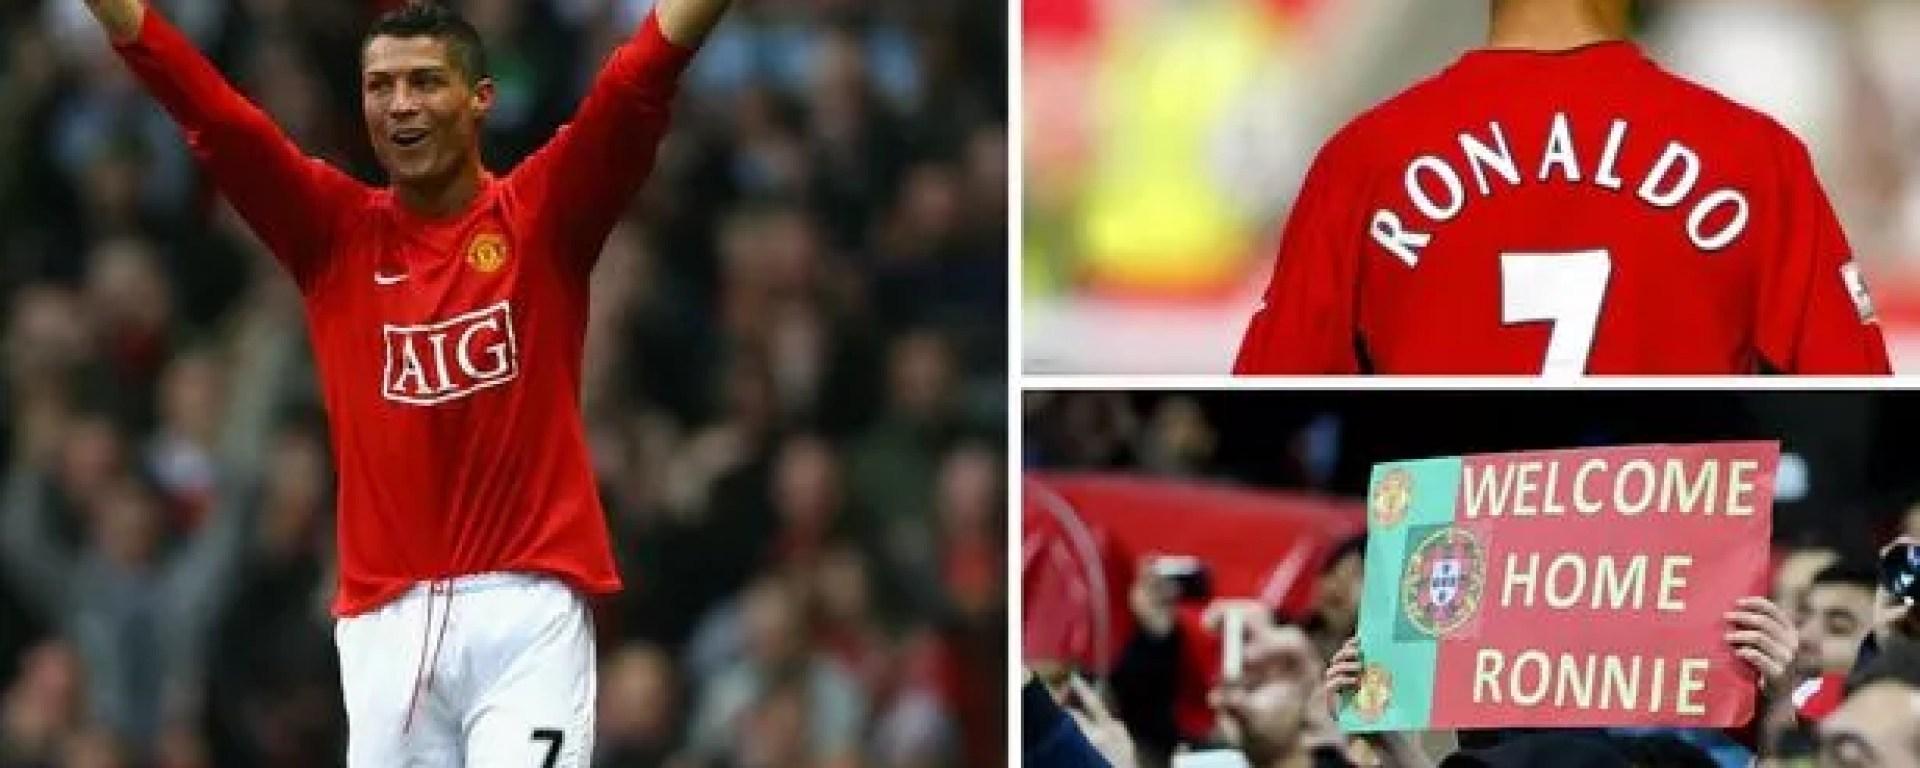 Eksklusif Mengapa Cristiano Ronaldo Harus Kembali Ke